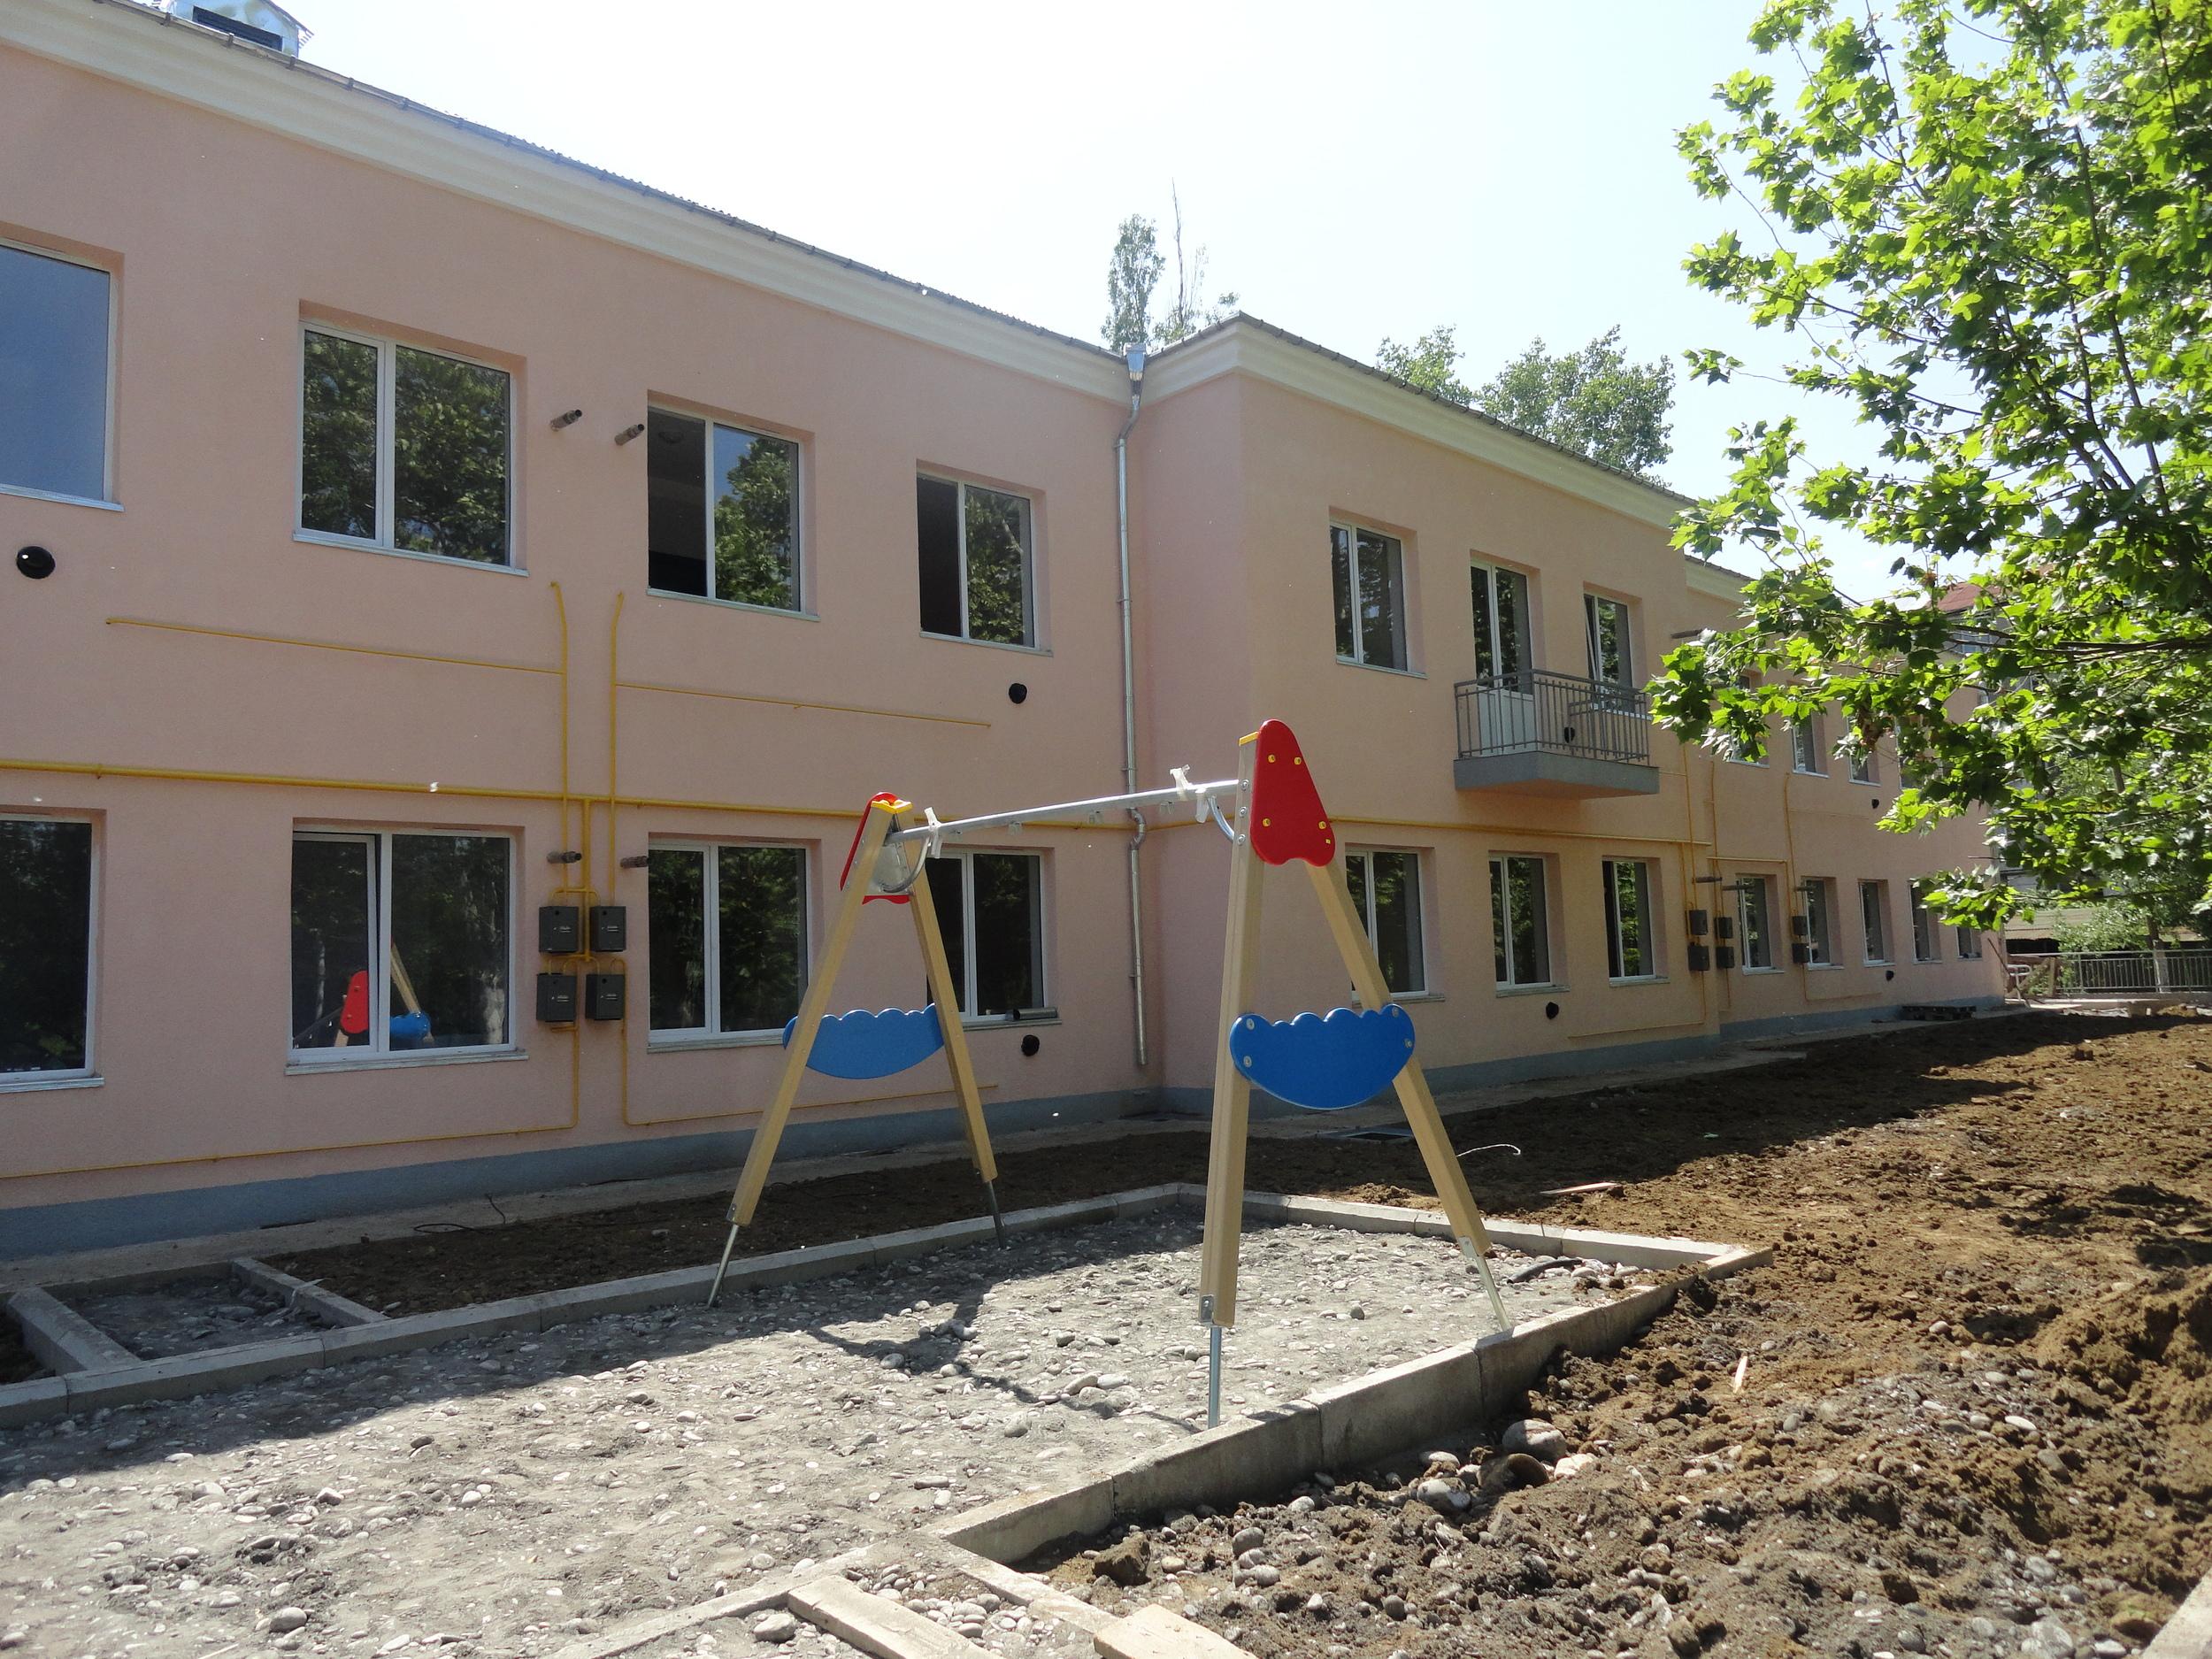 Public Building Rehabilitation for Refugees, Republic of Georgia